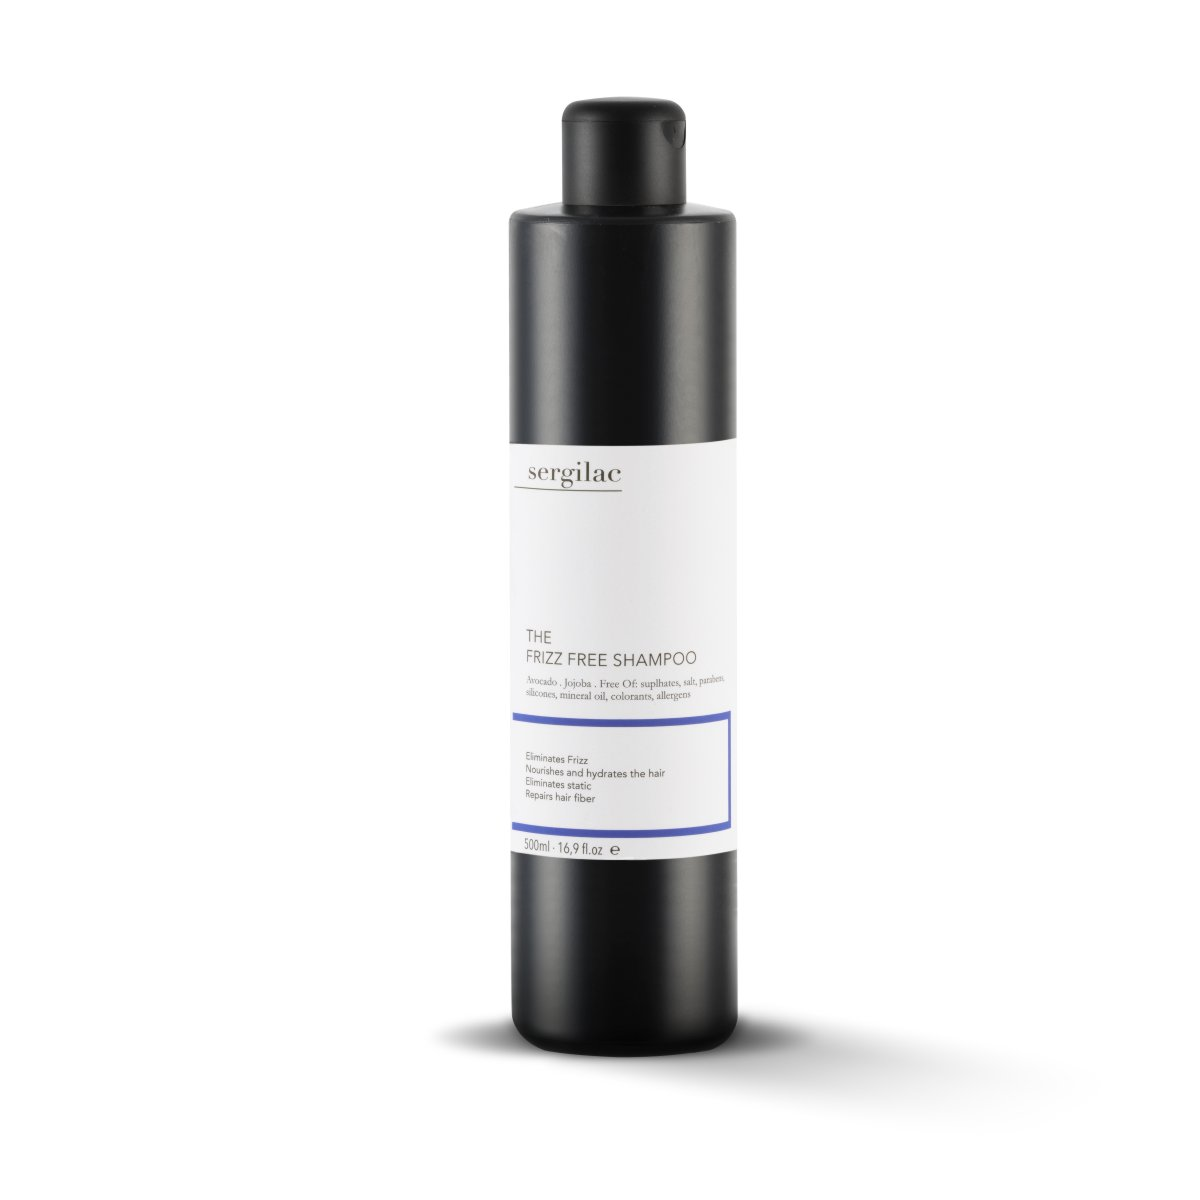 The Frizz Free Shampoo - Sergilac 500ml